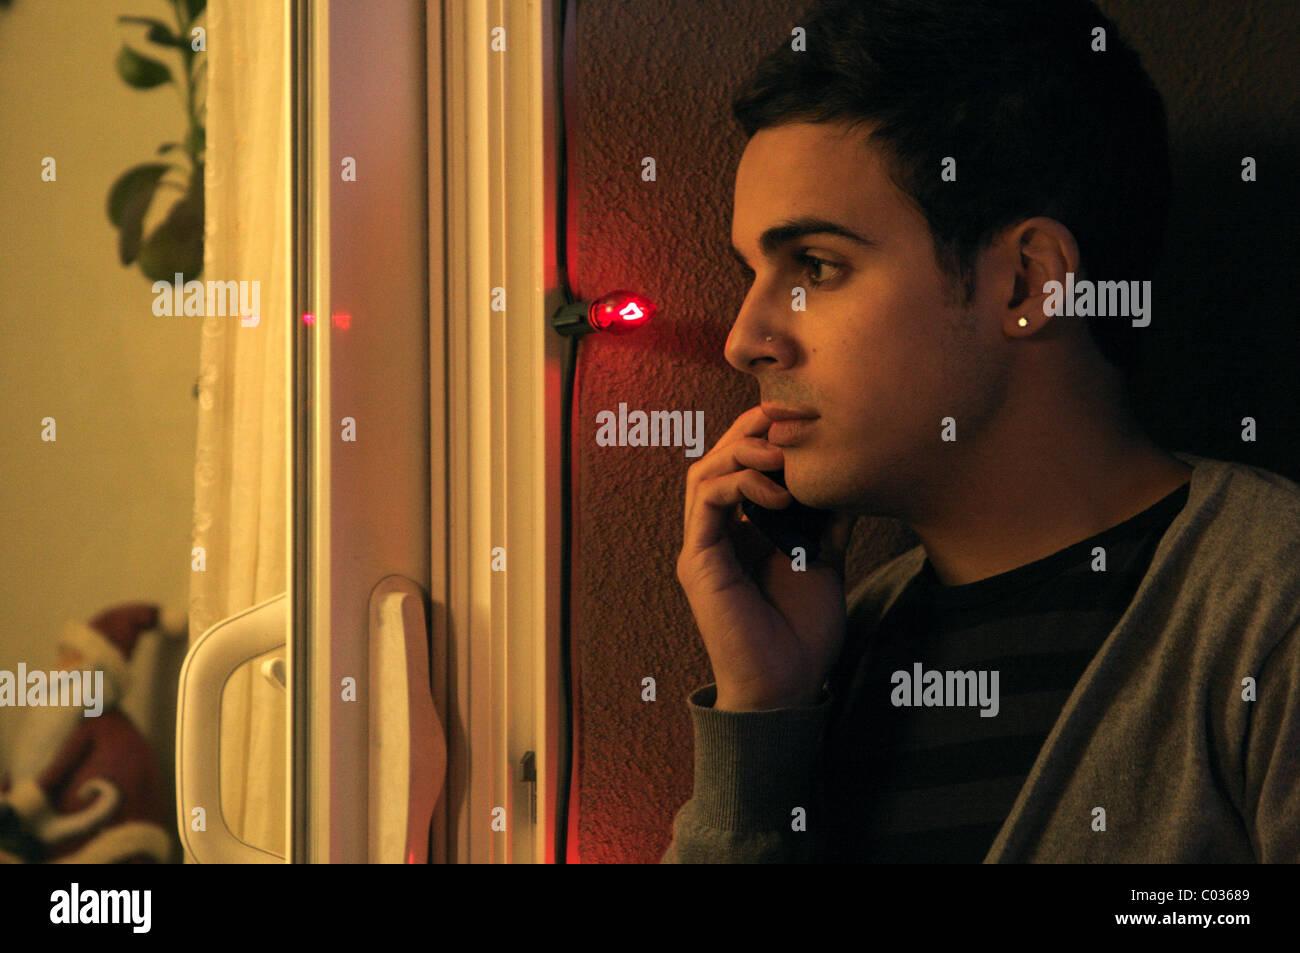 ADAMO RUGGIERO MAKE THE YULETIDE GAY (2009) - Stock Image